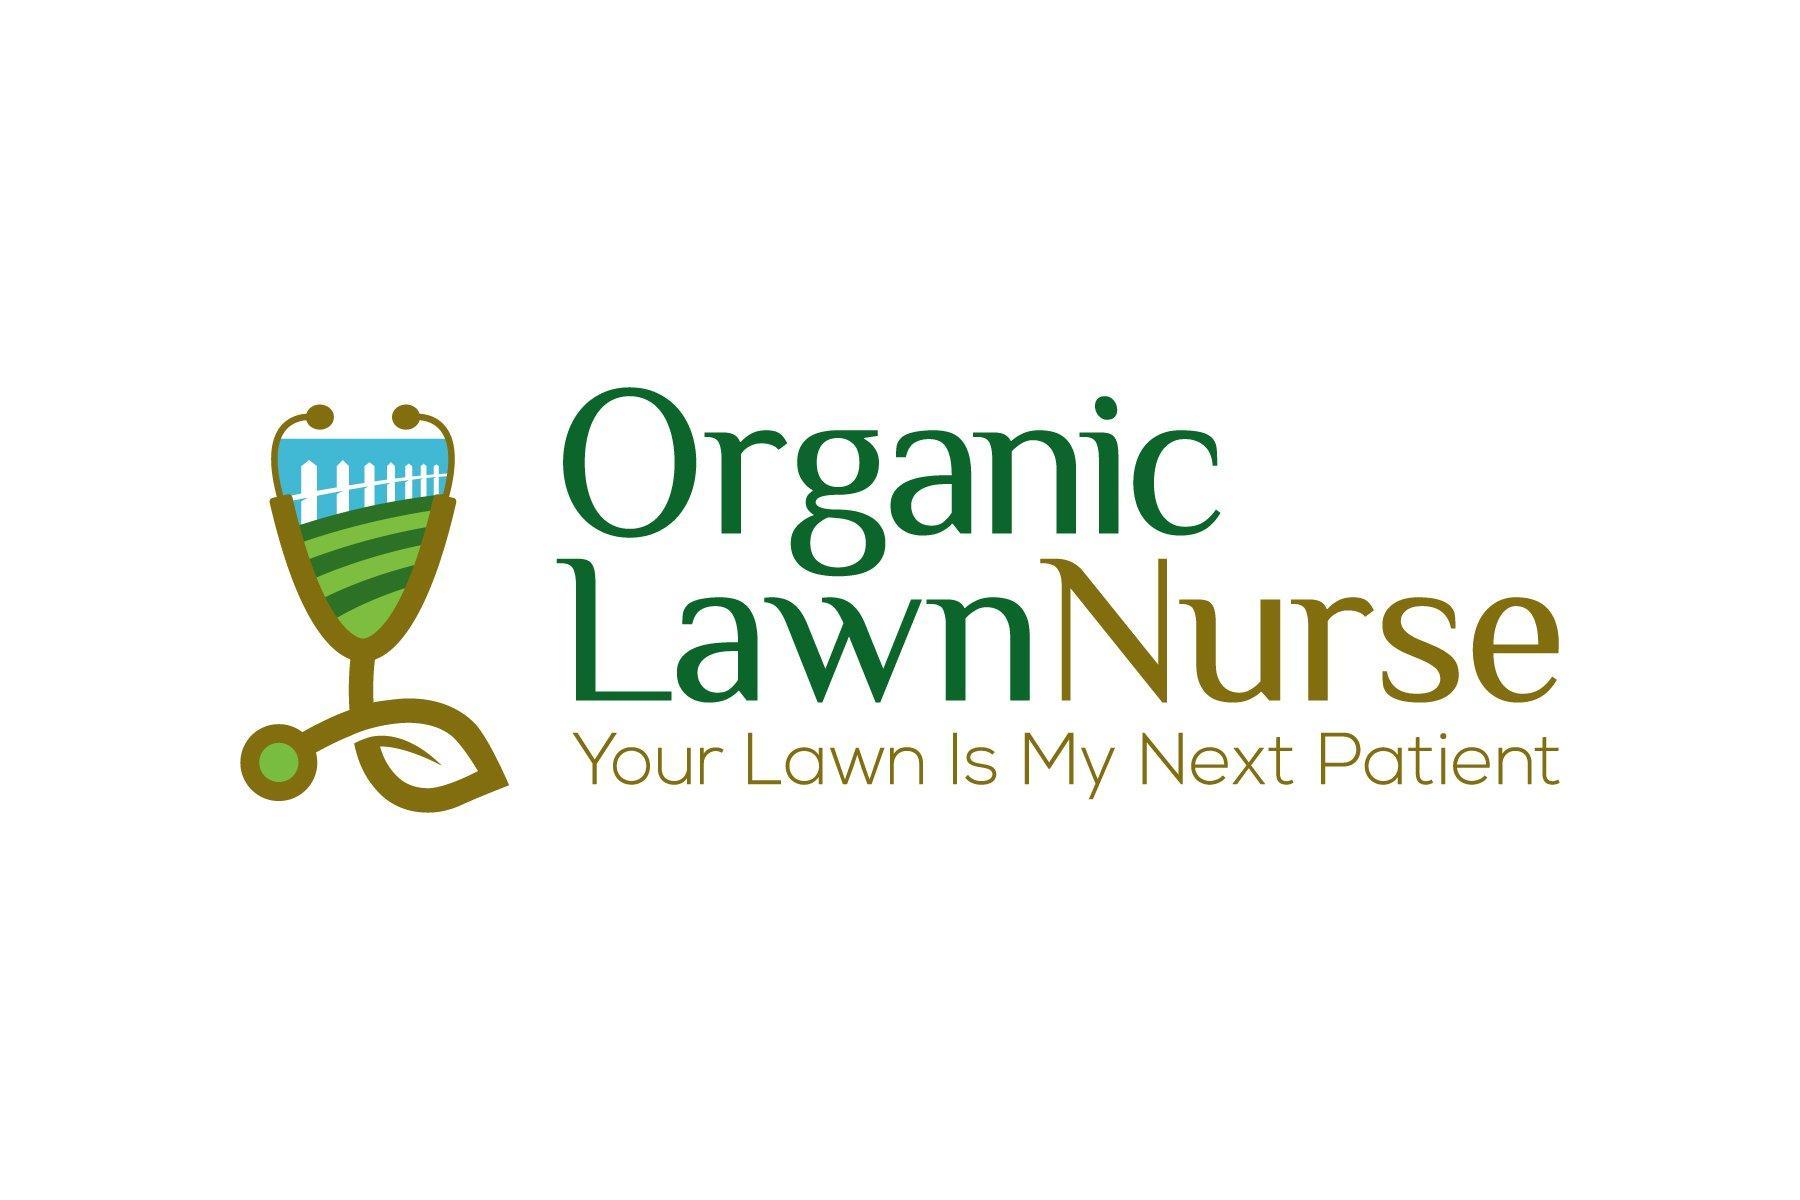 Lawn Care, Landscape Design, Lawn Care Specialists